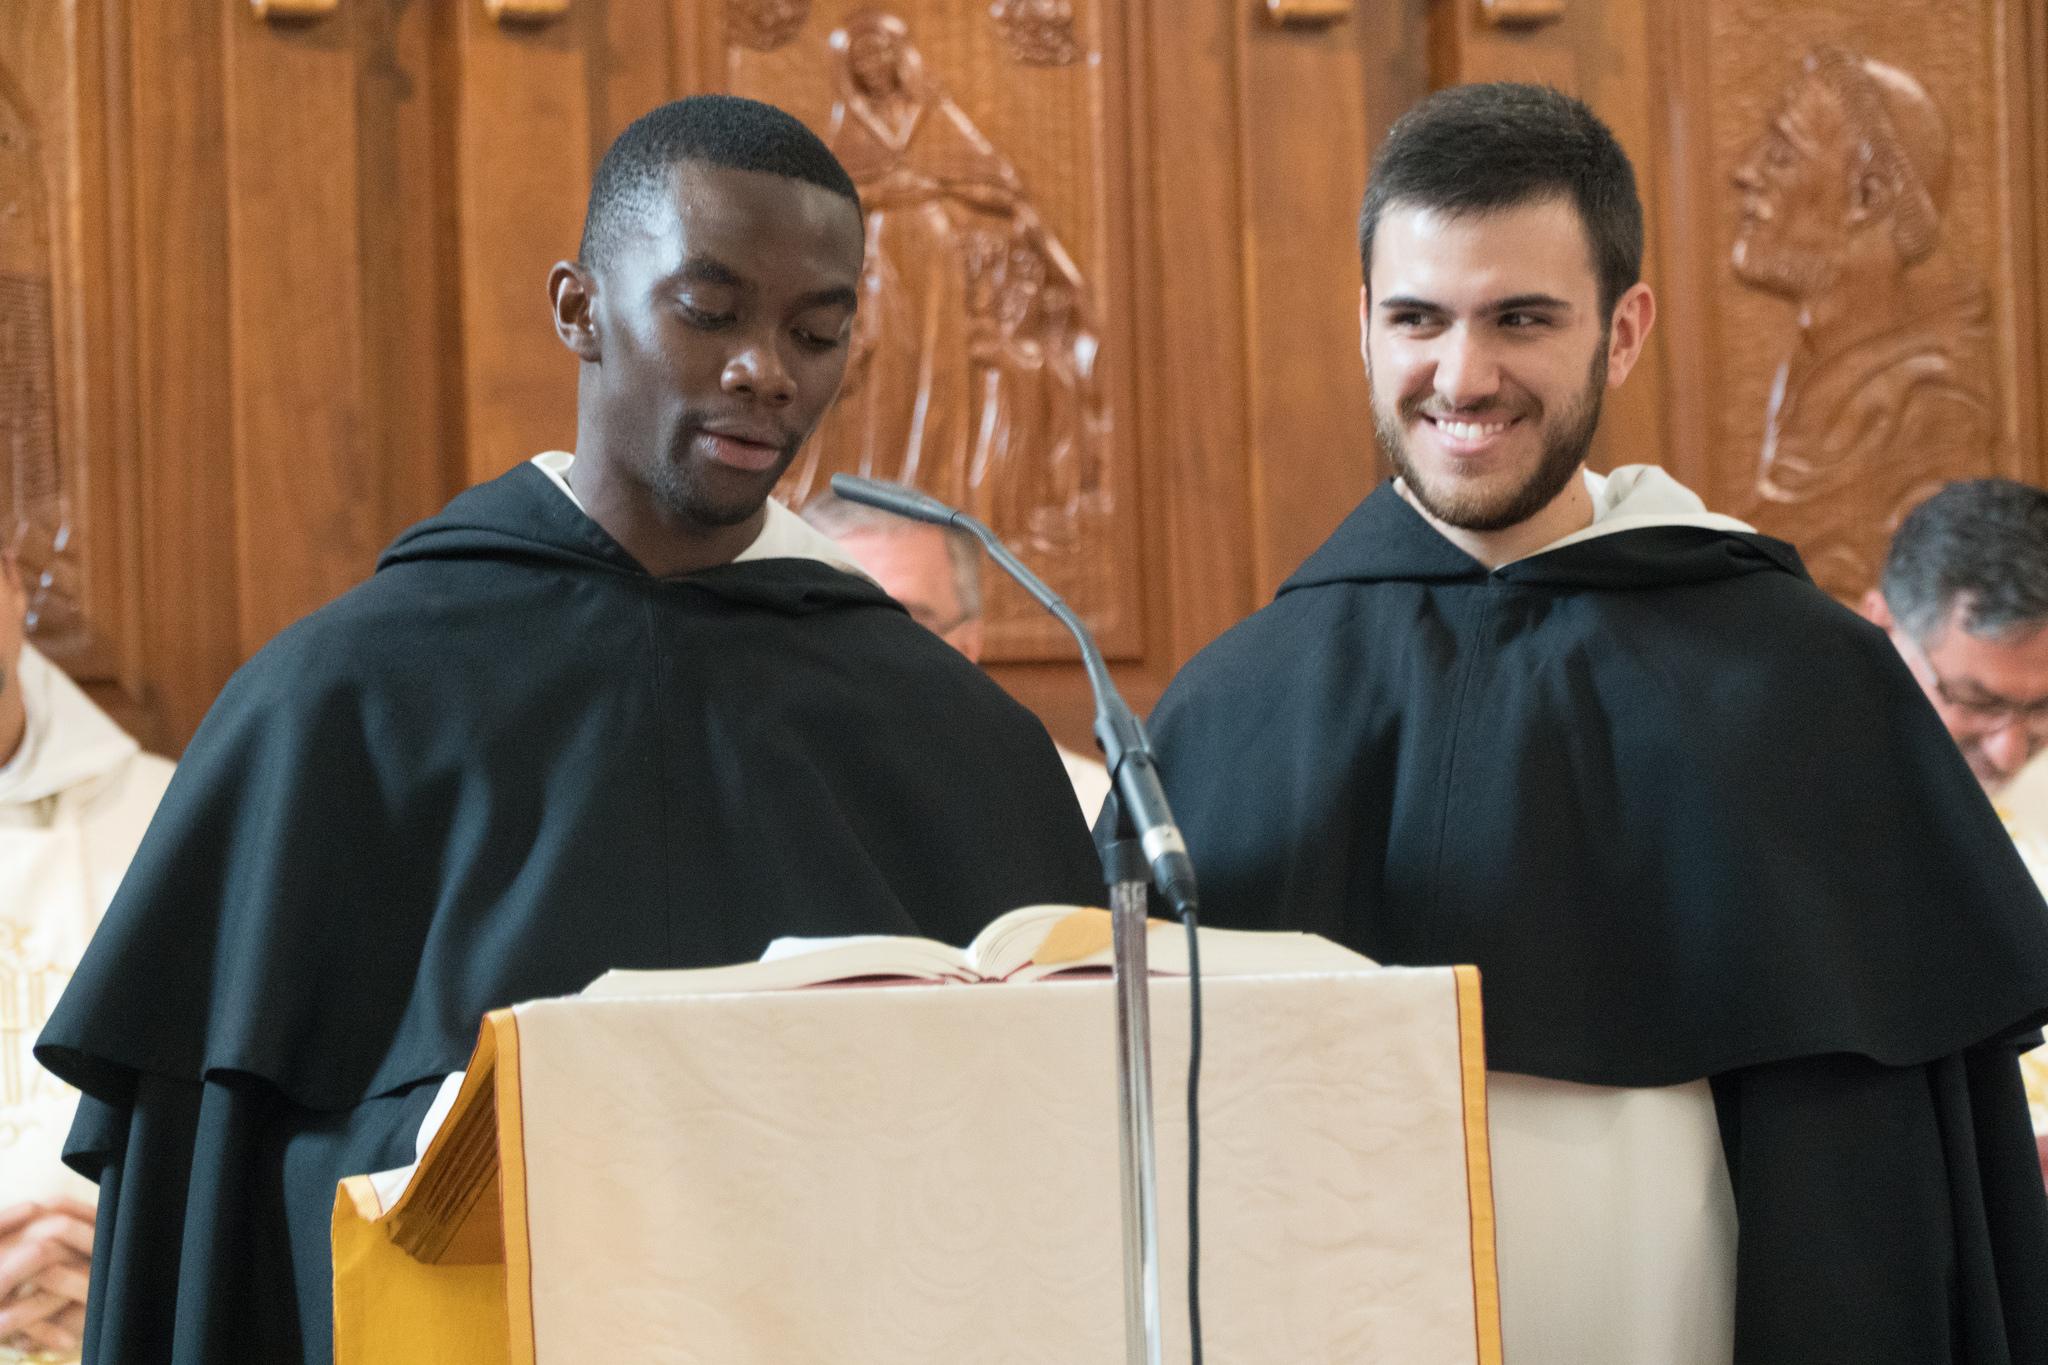 Fr. Bernando Sastre y Fr. Esteban